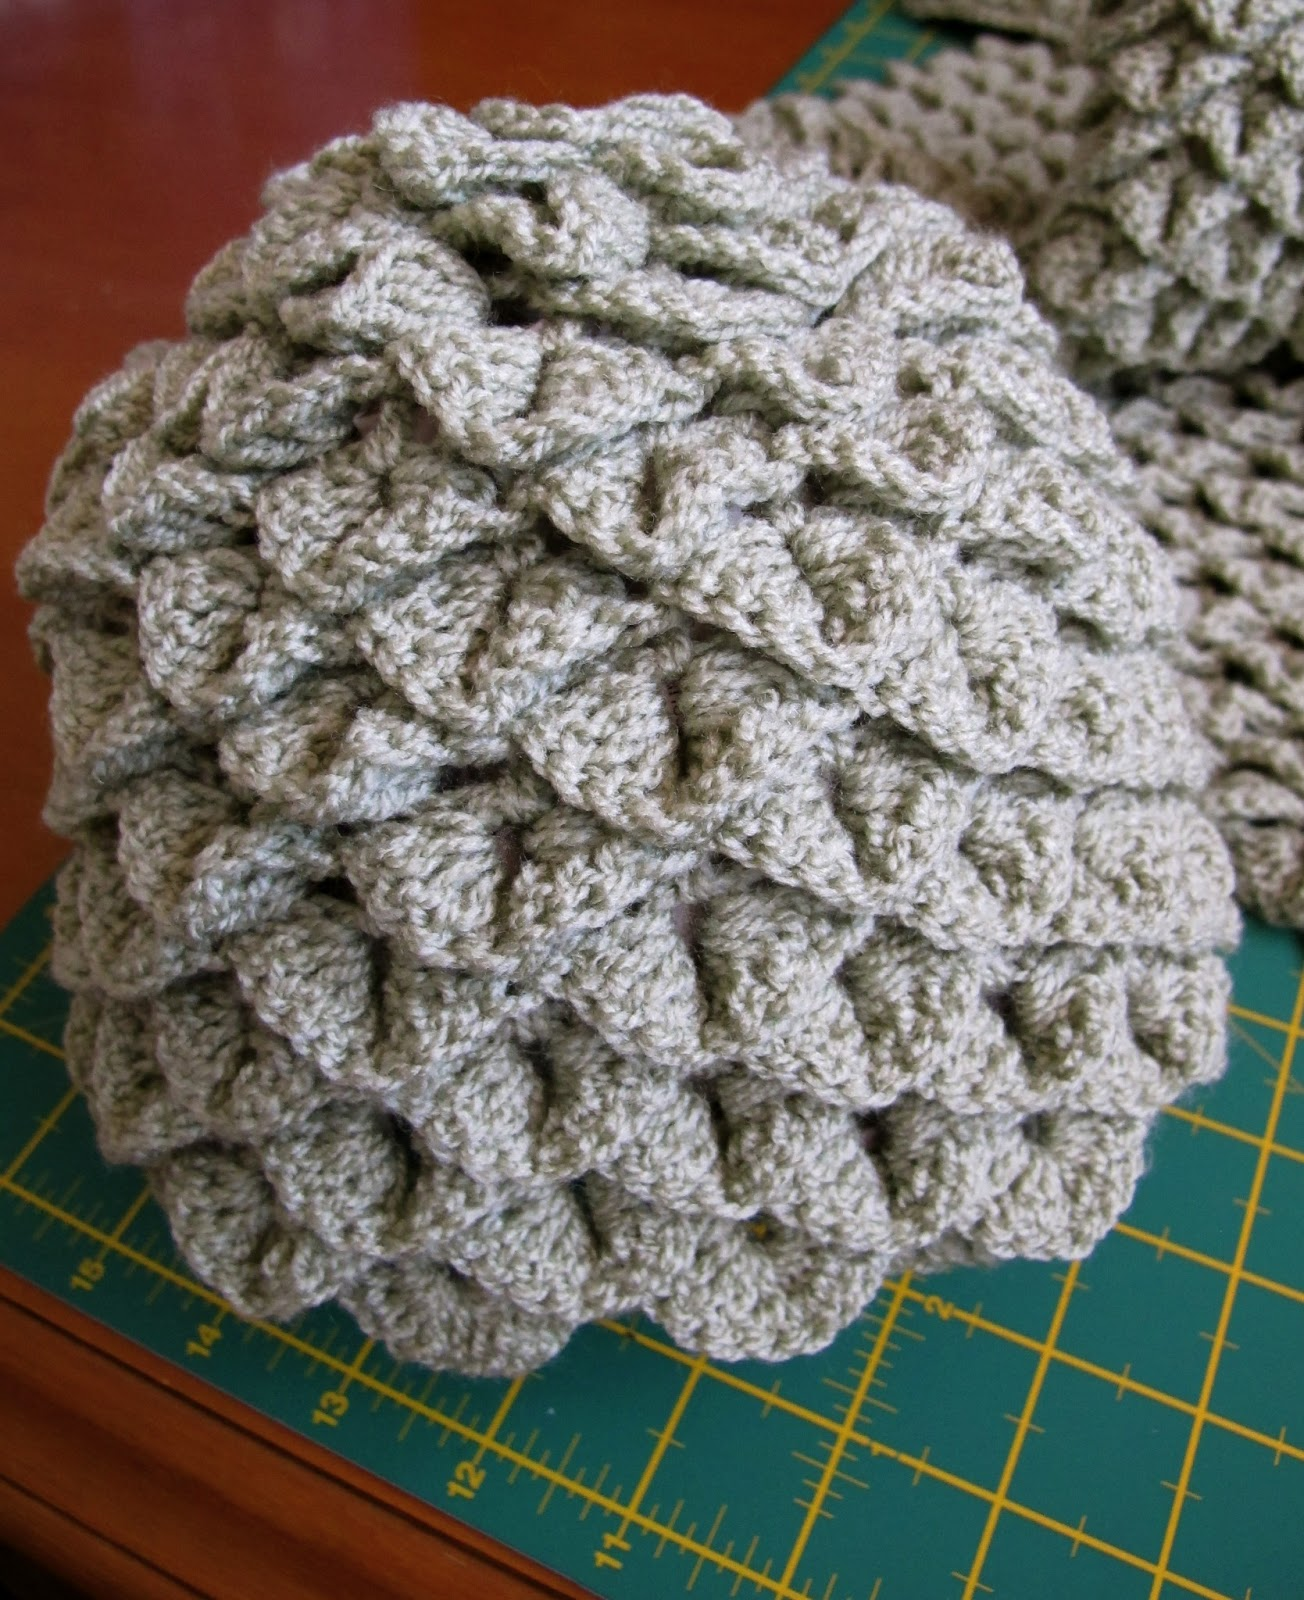 Crochet Scarf Pattern Diagram Youth Basketball Court Dimensions Hari Ku Topi Dan Crocodile Stitch